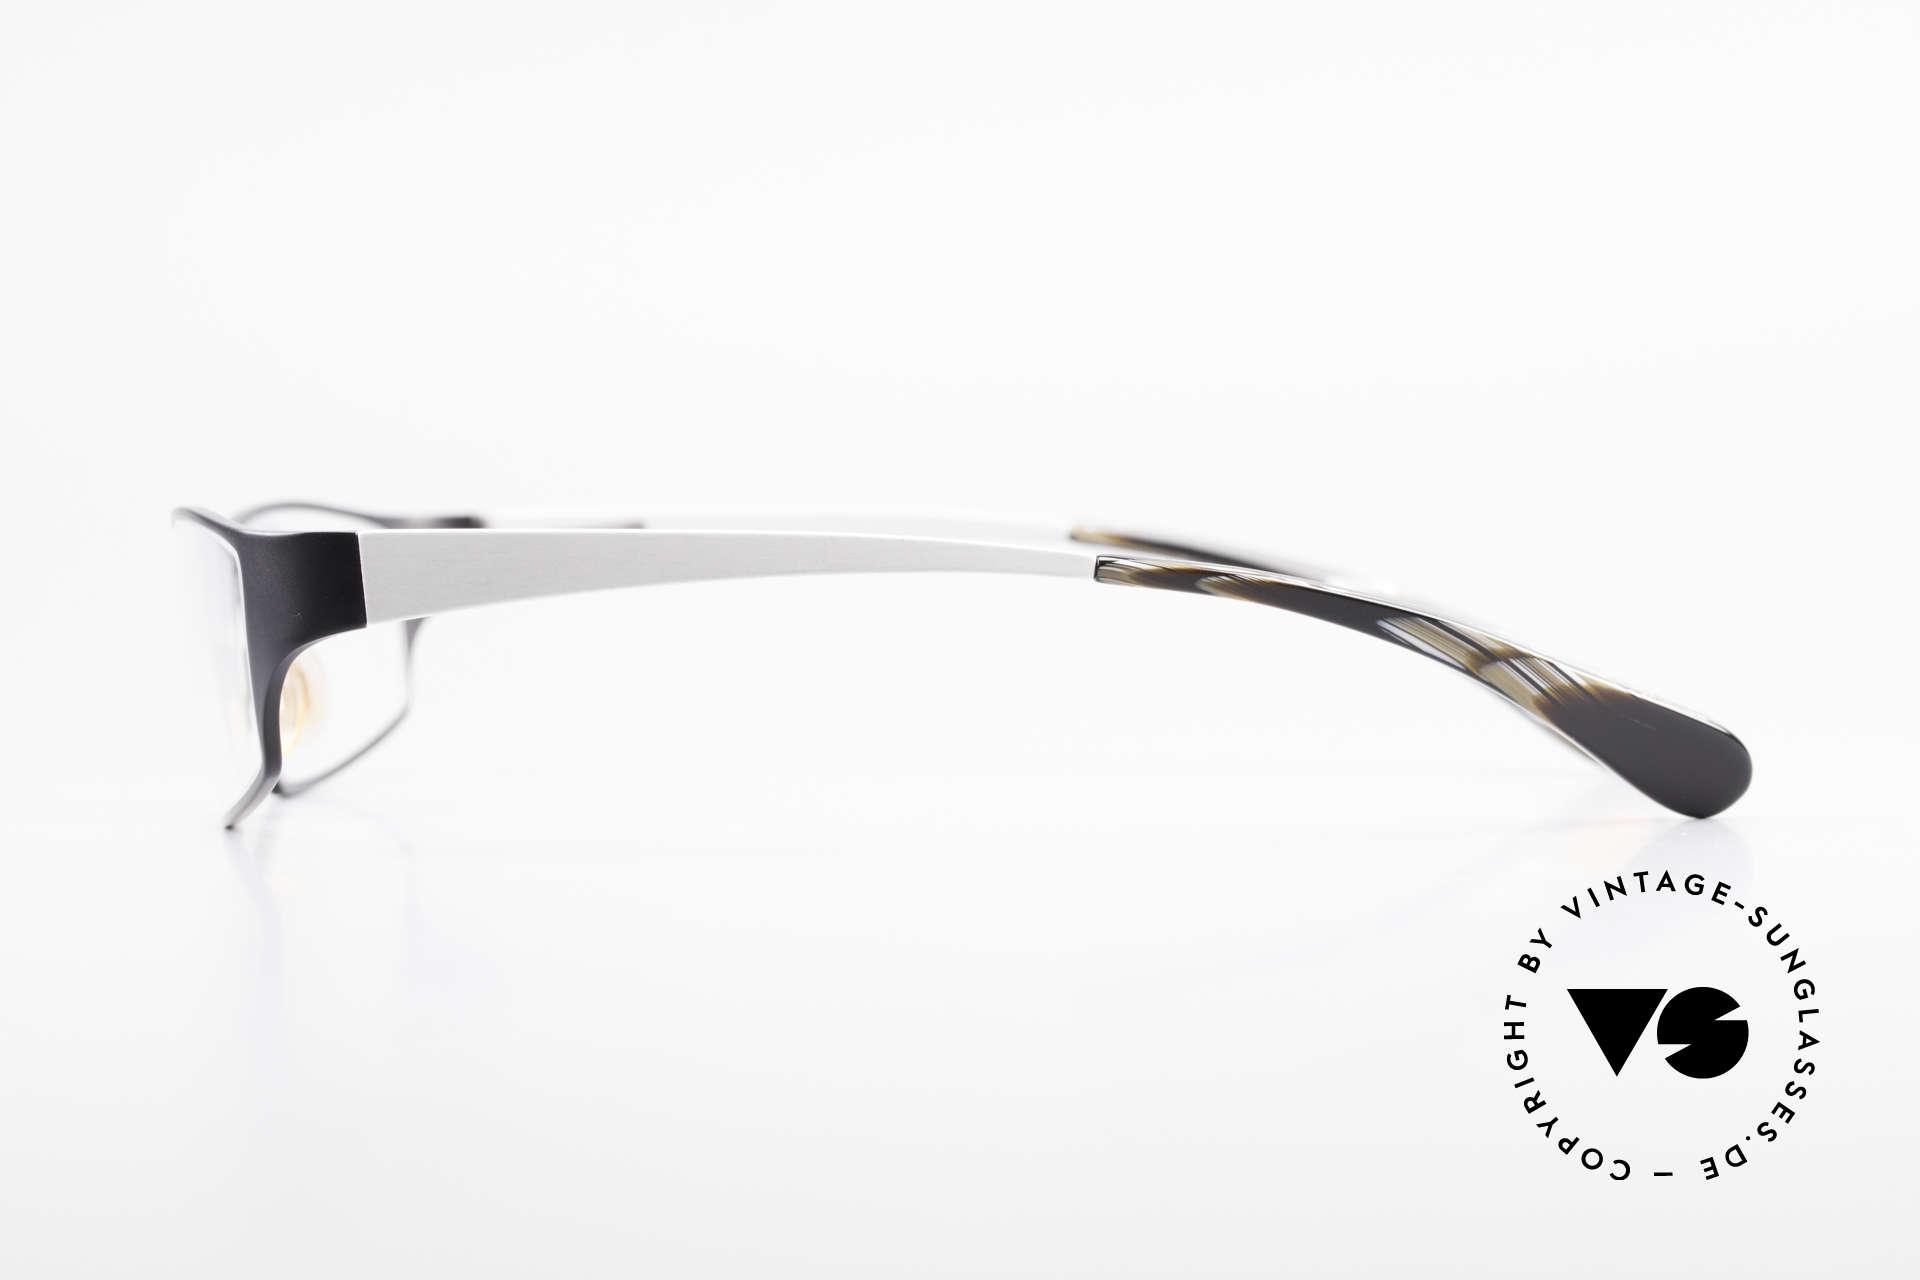 Bugatti 207 Odotype Luxury Designer Frame Men, Size: medium, Made for Men